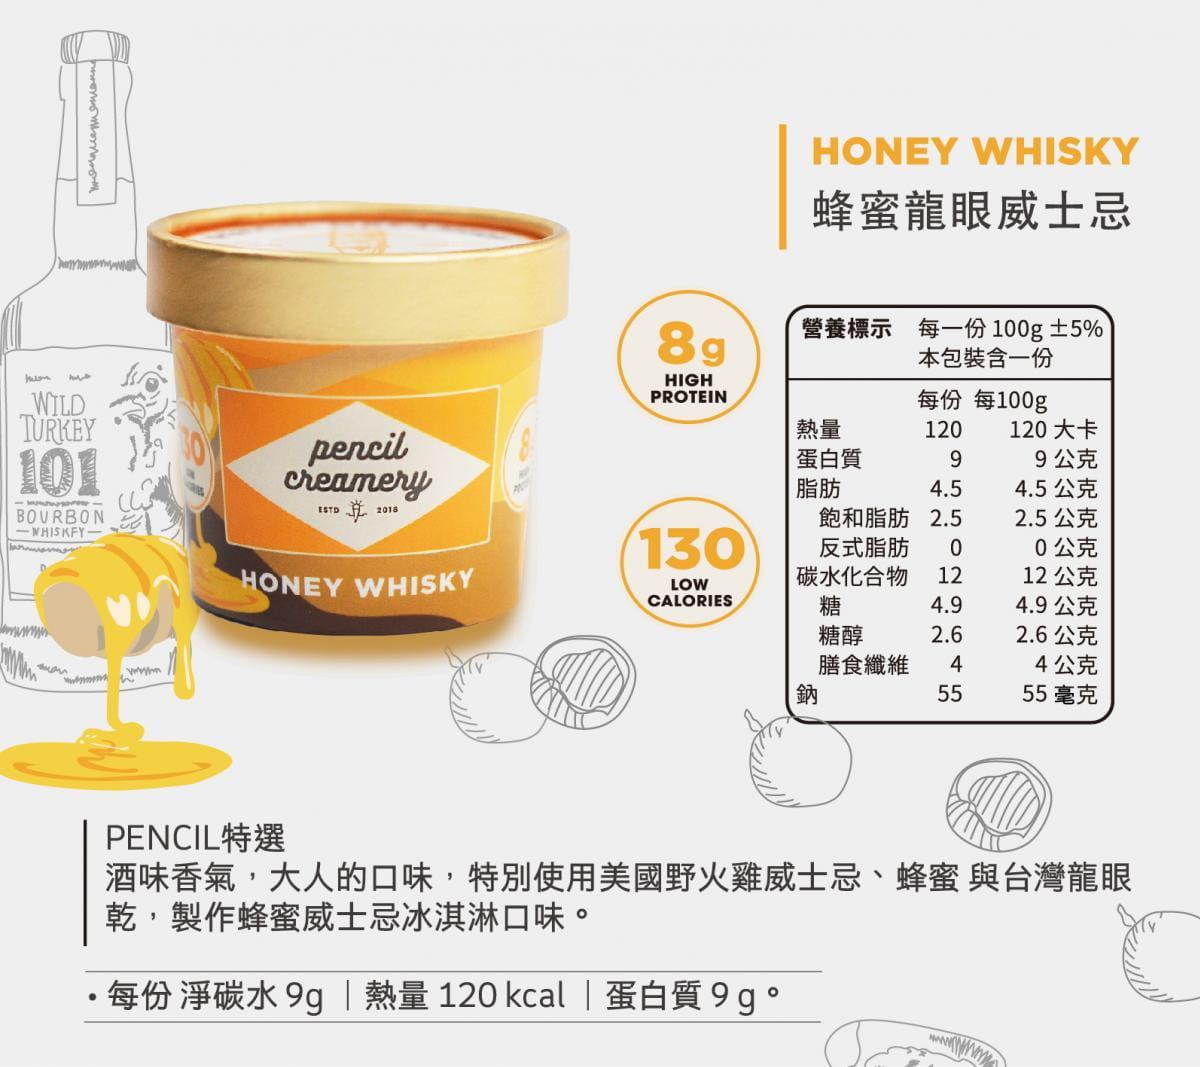 【PENCIL CREAMERY】低脂高蛋白冰淇淋6入起/盒(口味任選) 7